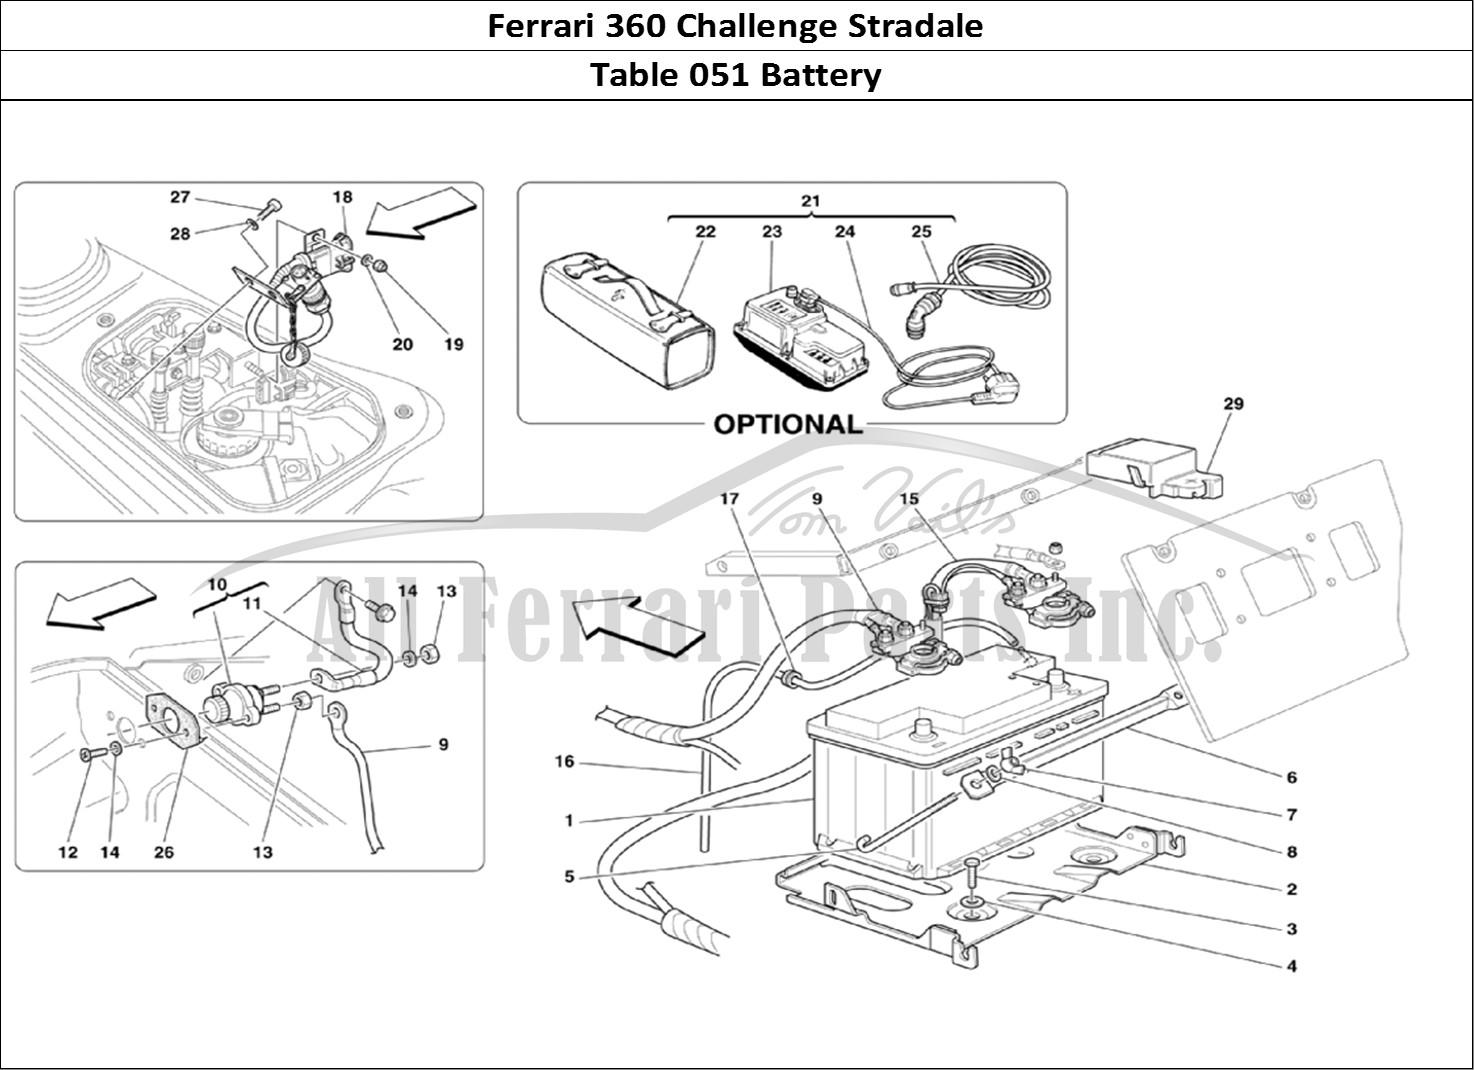 Buy Original Ferrari 360 Challenge Stradale 051 Battery